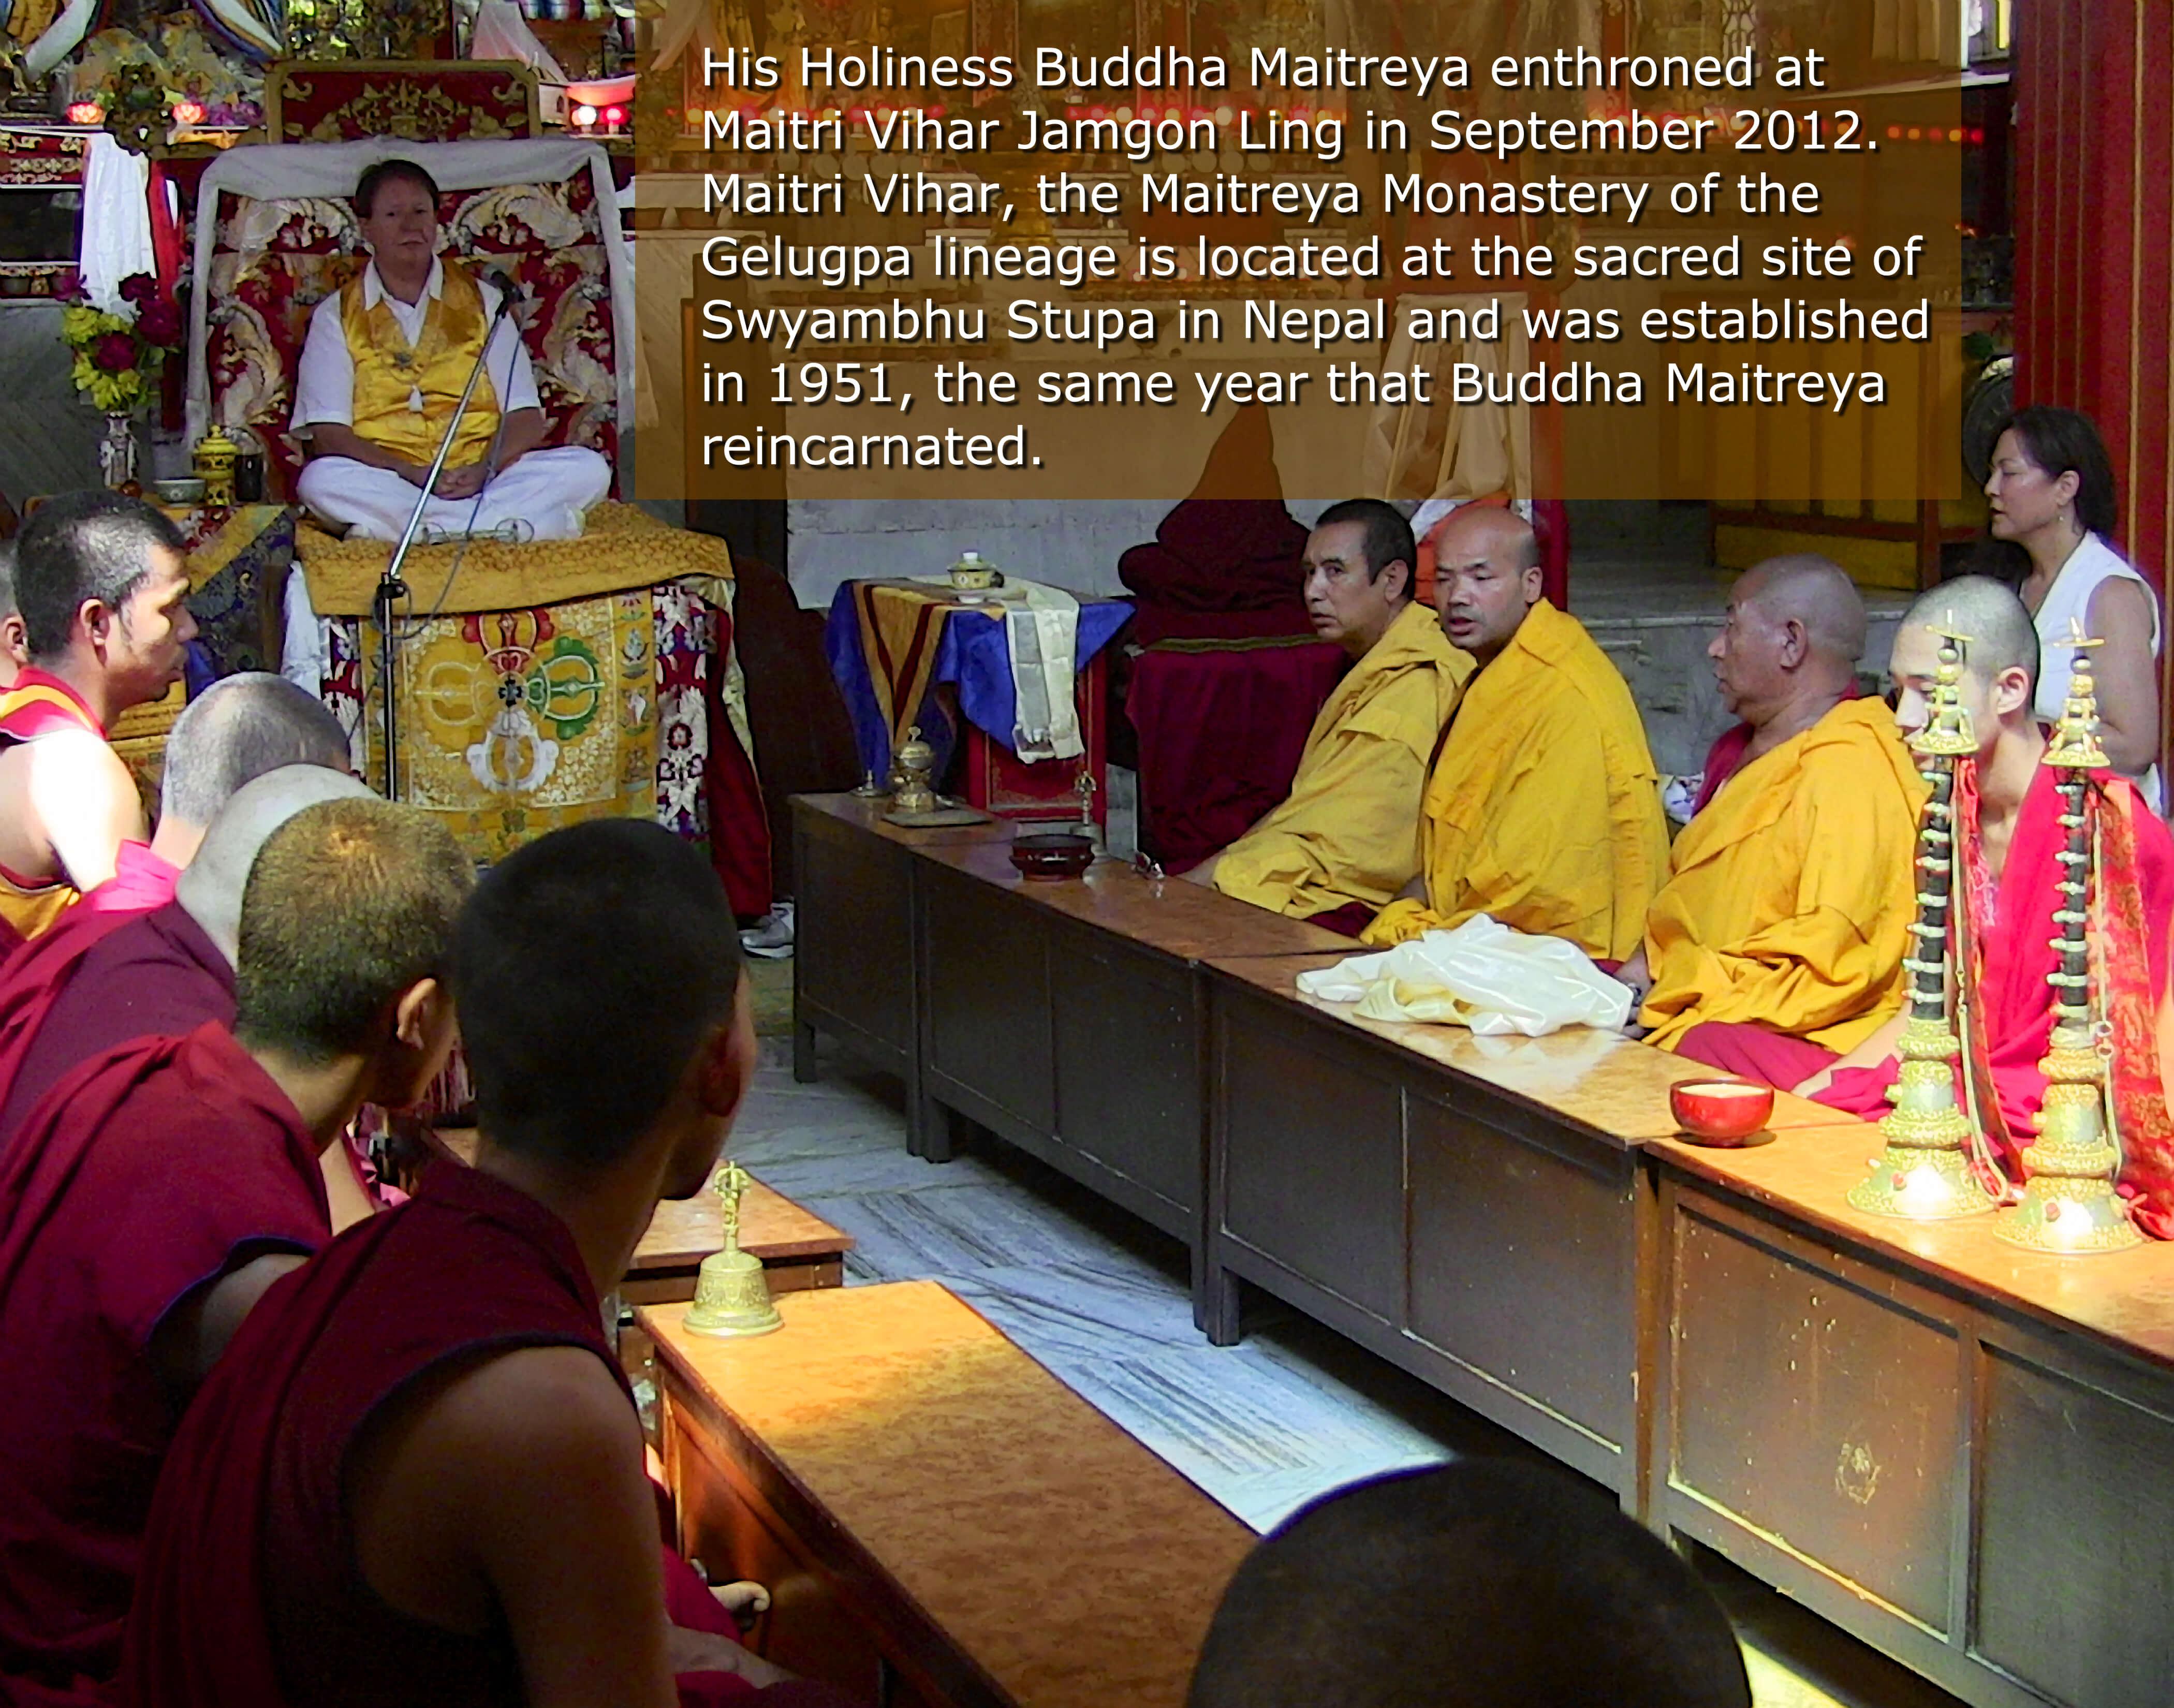 Buddha Maitreya Enthroned at Maitri Vihar